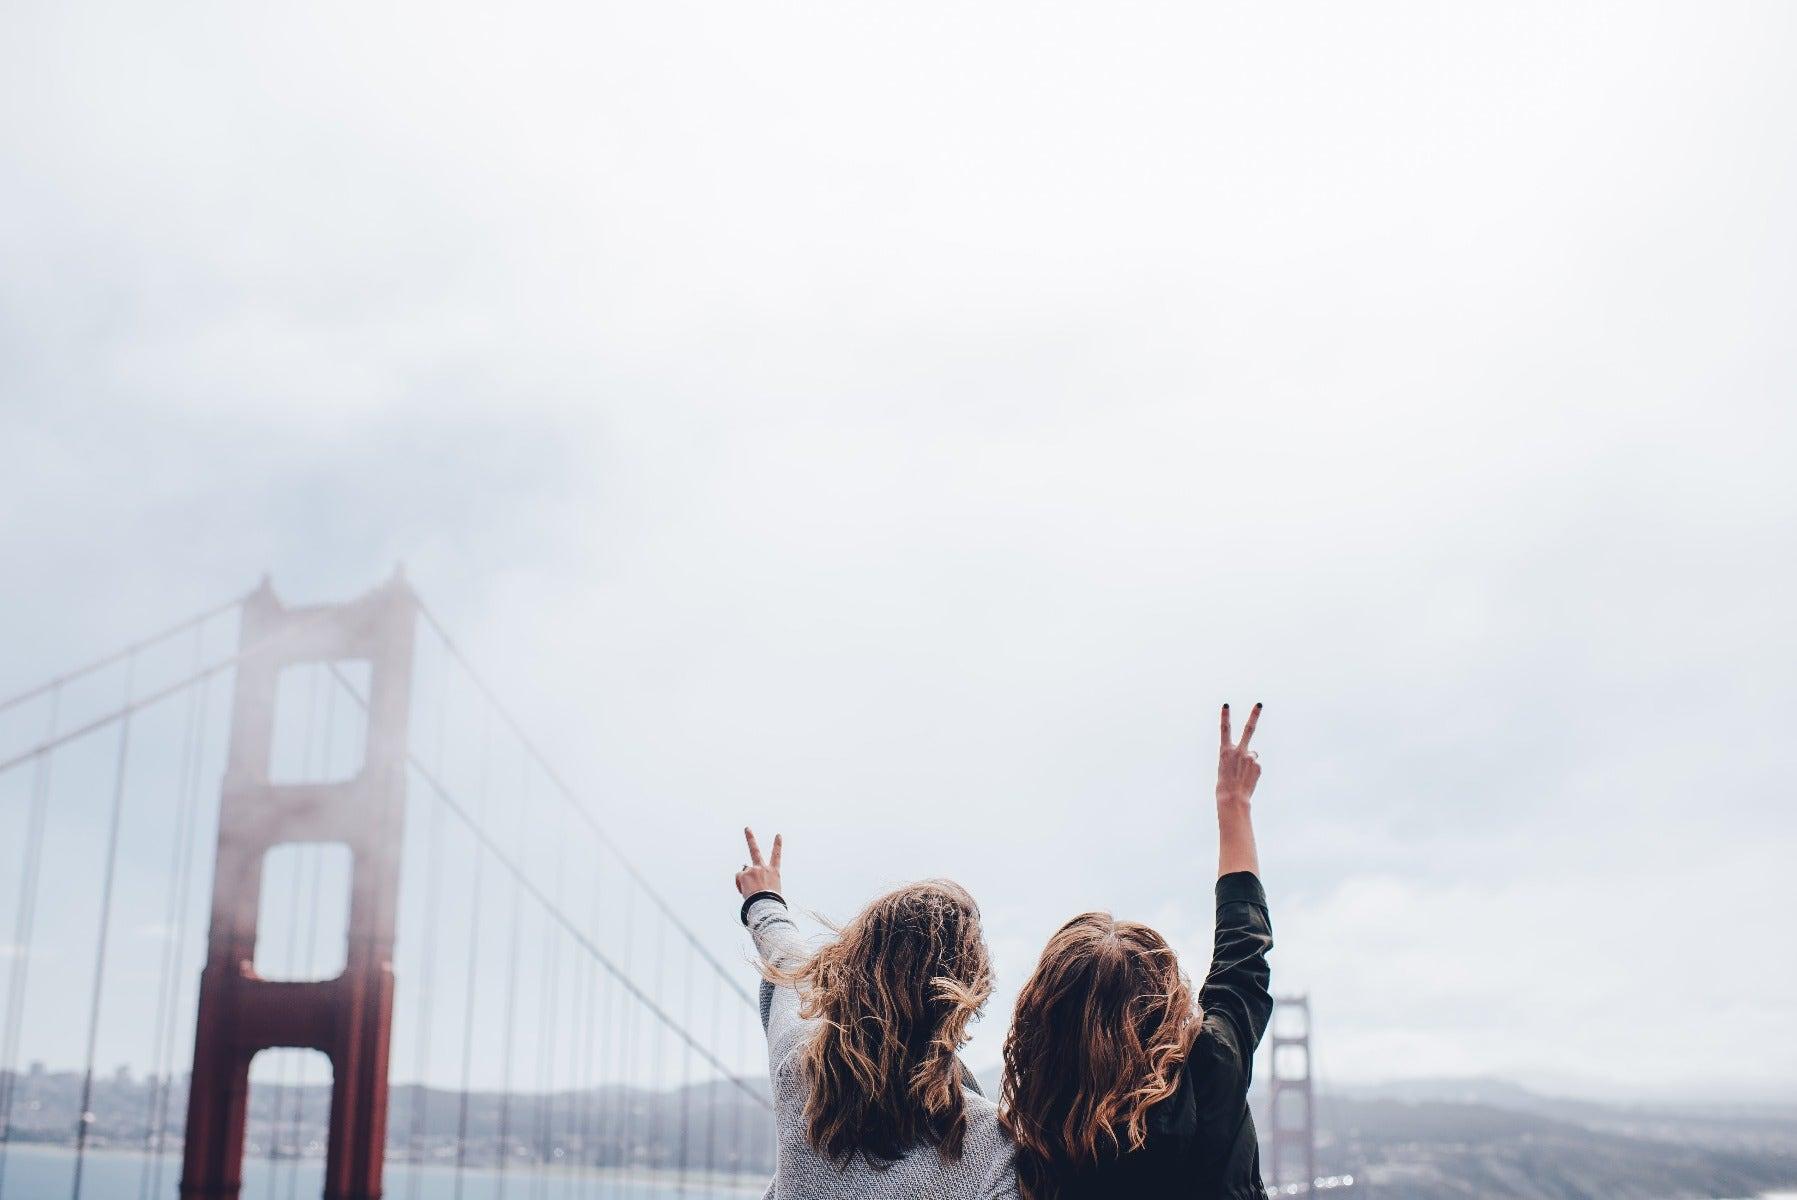 Travellers taking photos at Golden Gate Bridge